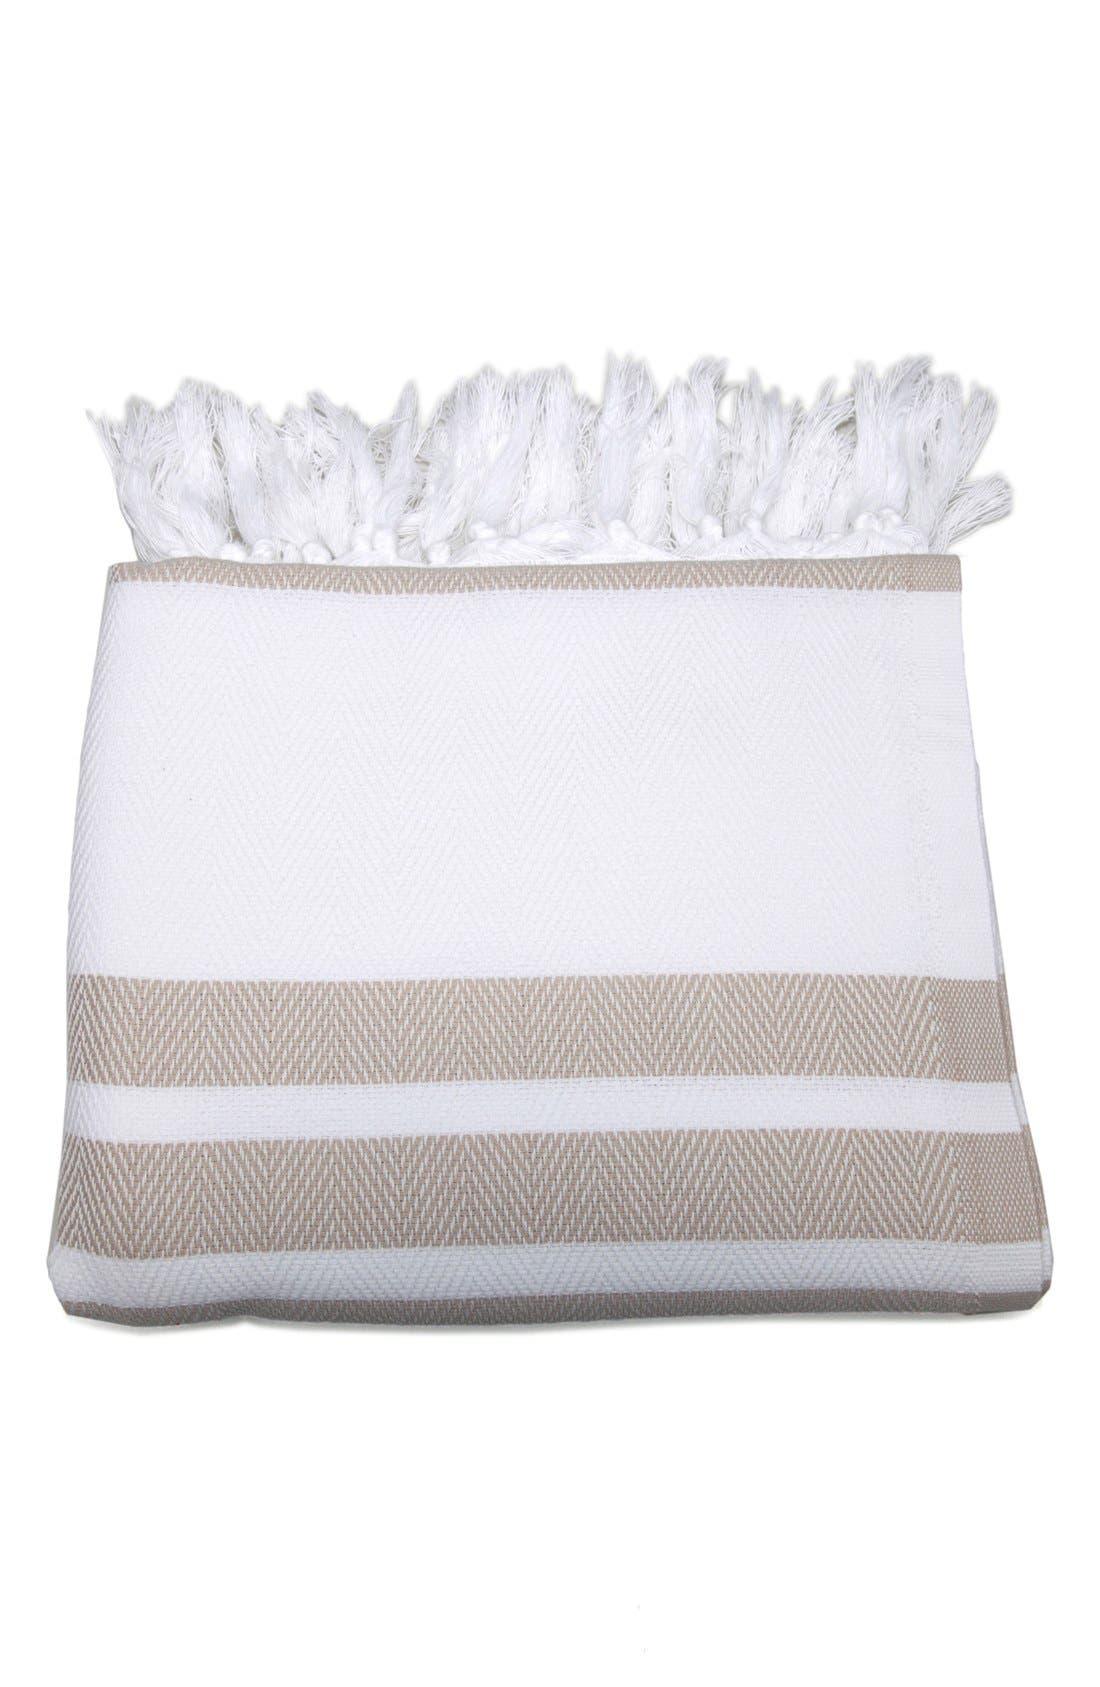 Linum Home Textiles Herringbone Striped Turkish Pestemal Towel